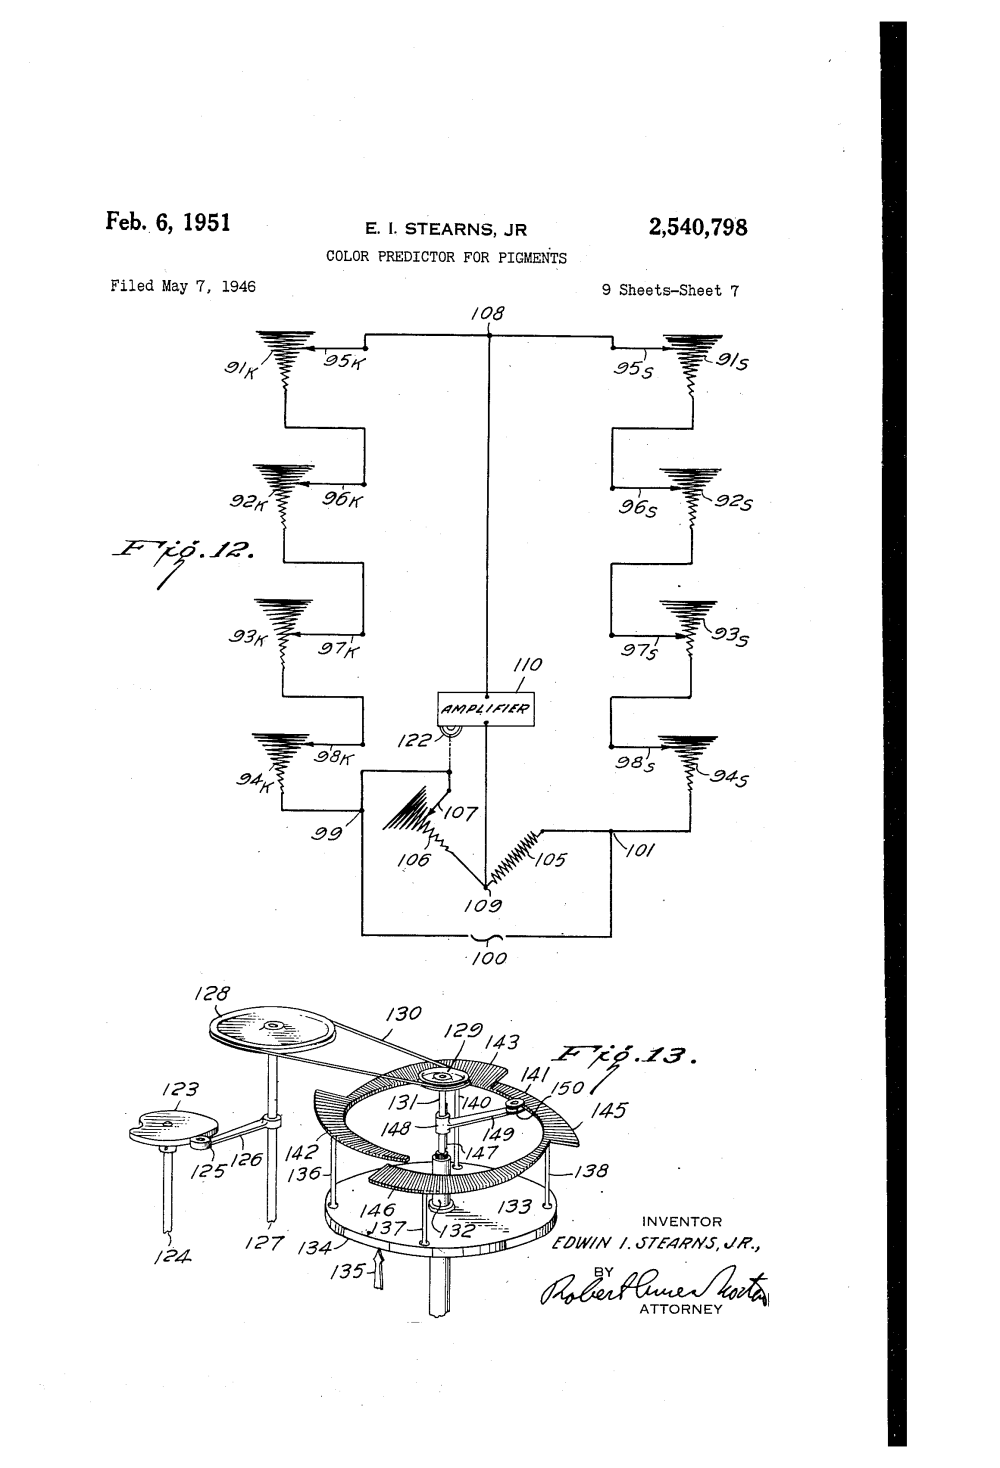 Dean Wiring Diagram - on